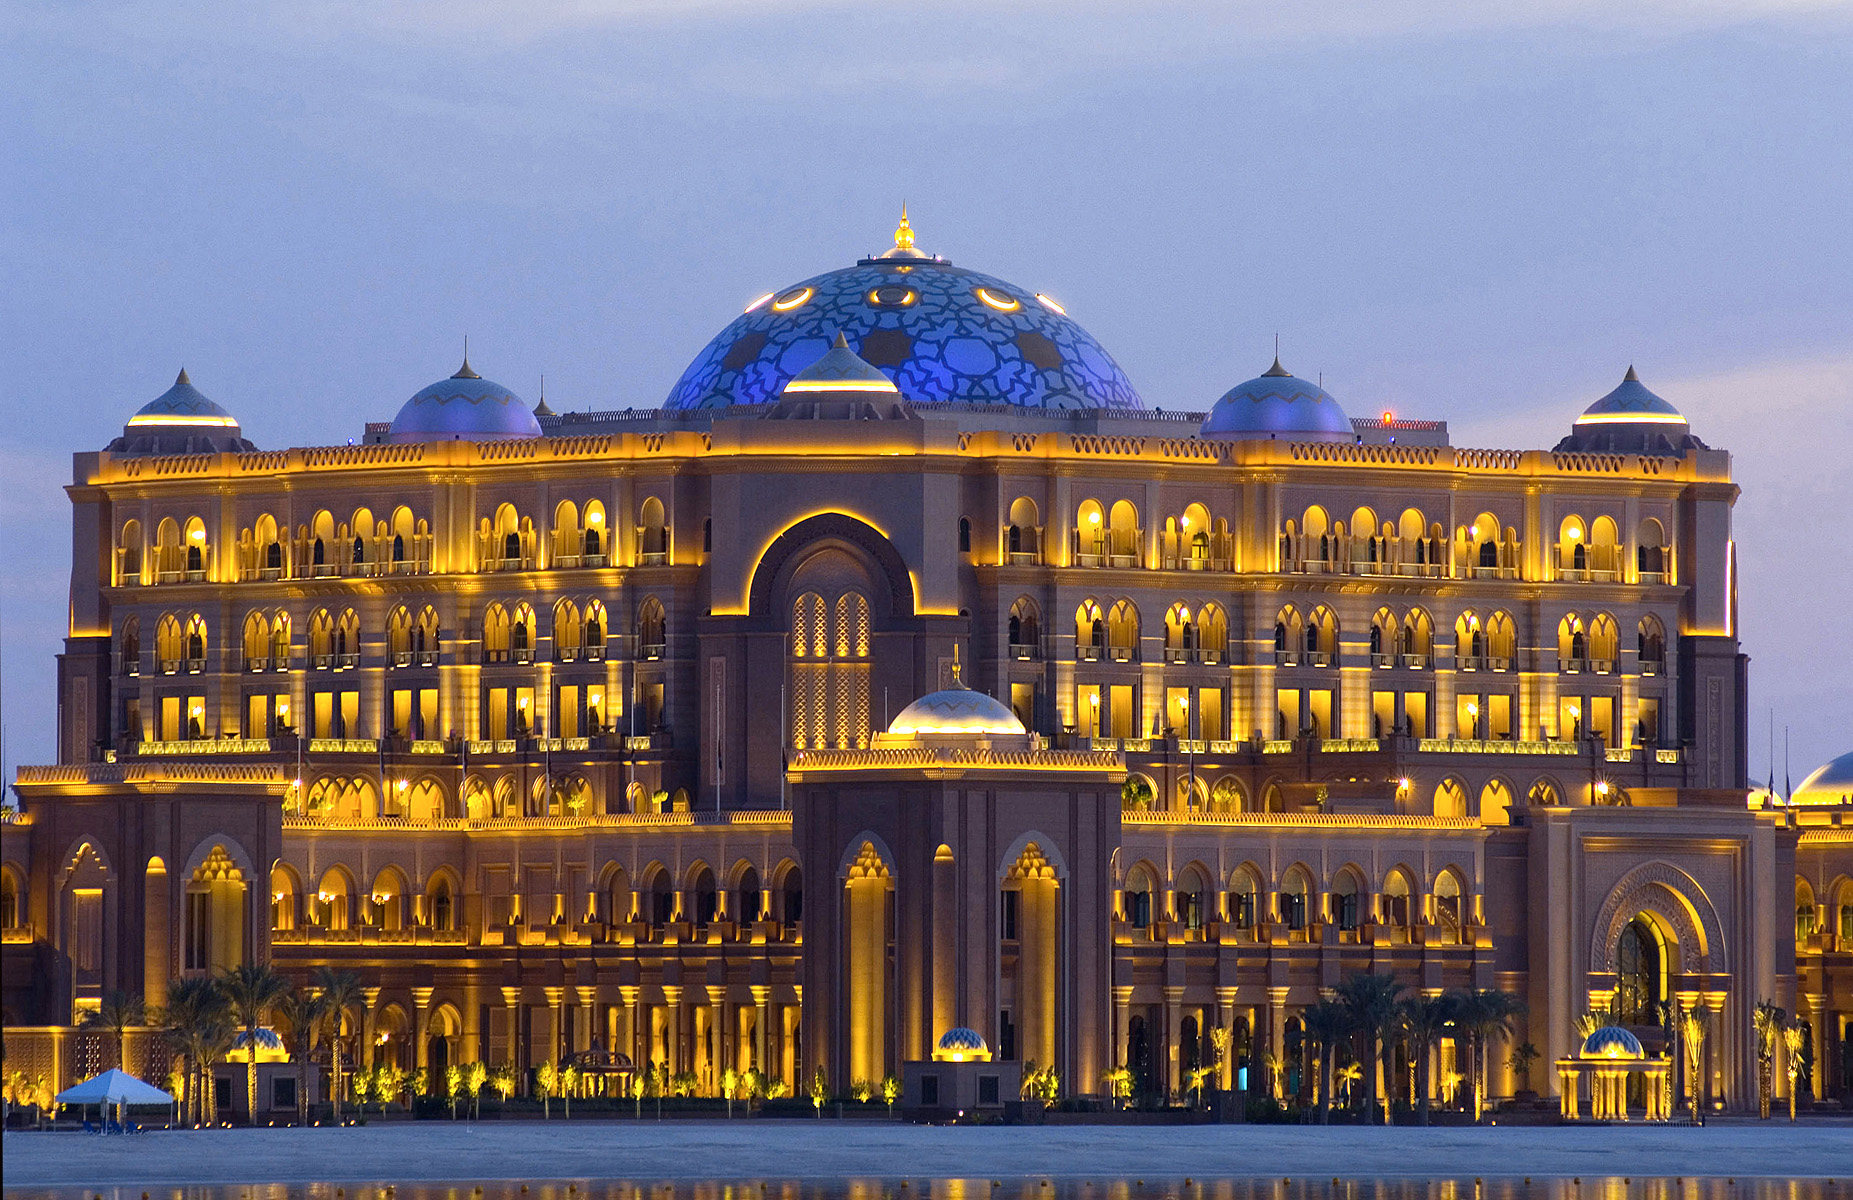 Emirates palace travelling moods for Hotel palace